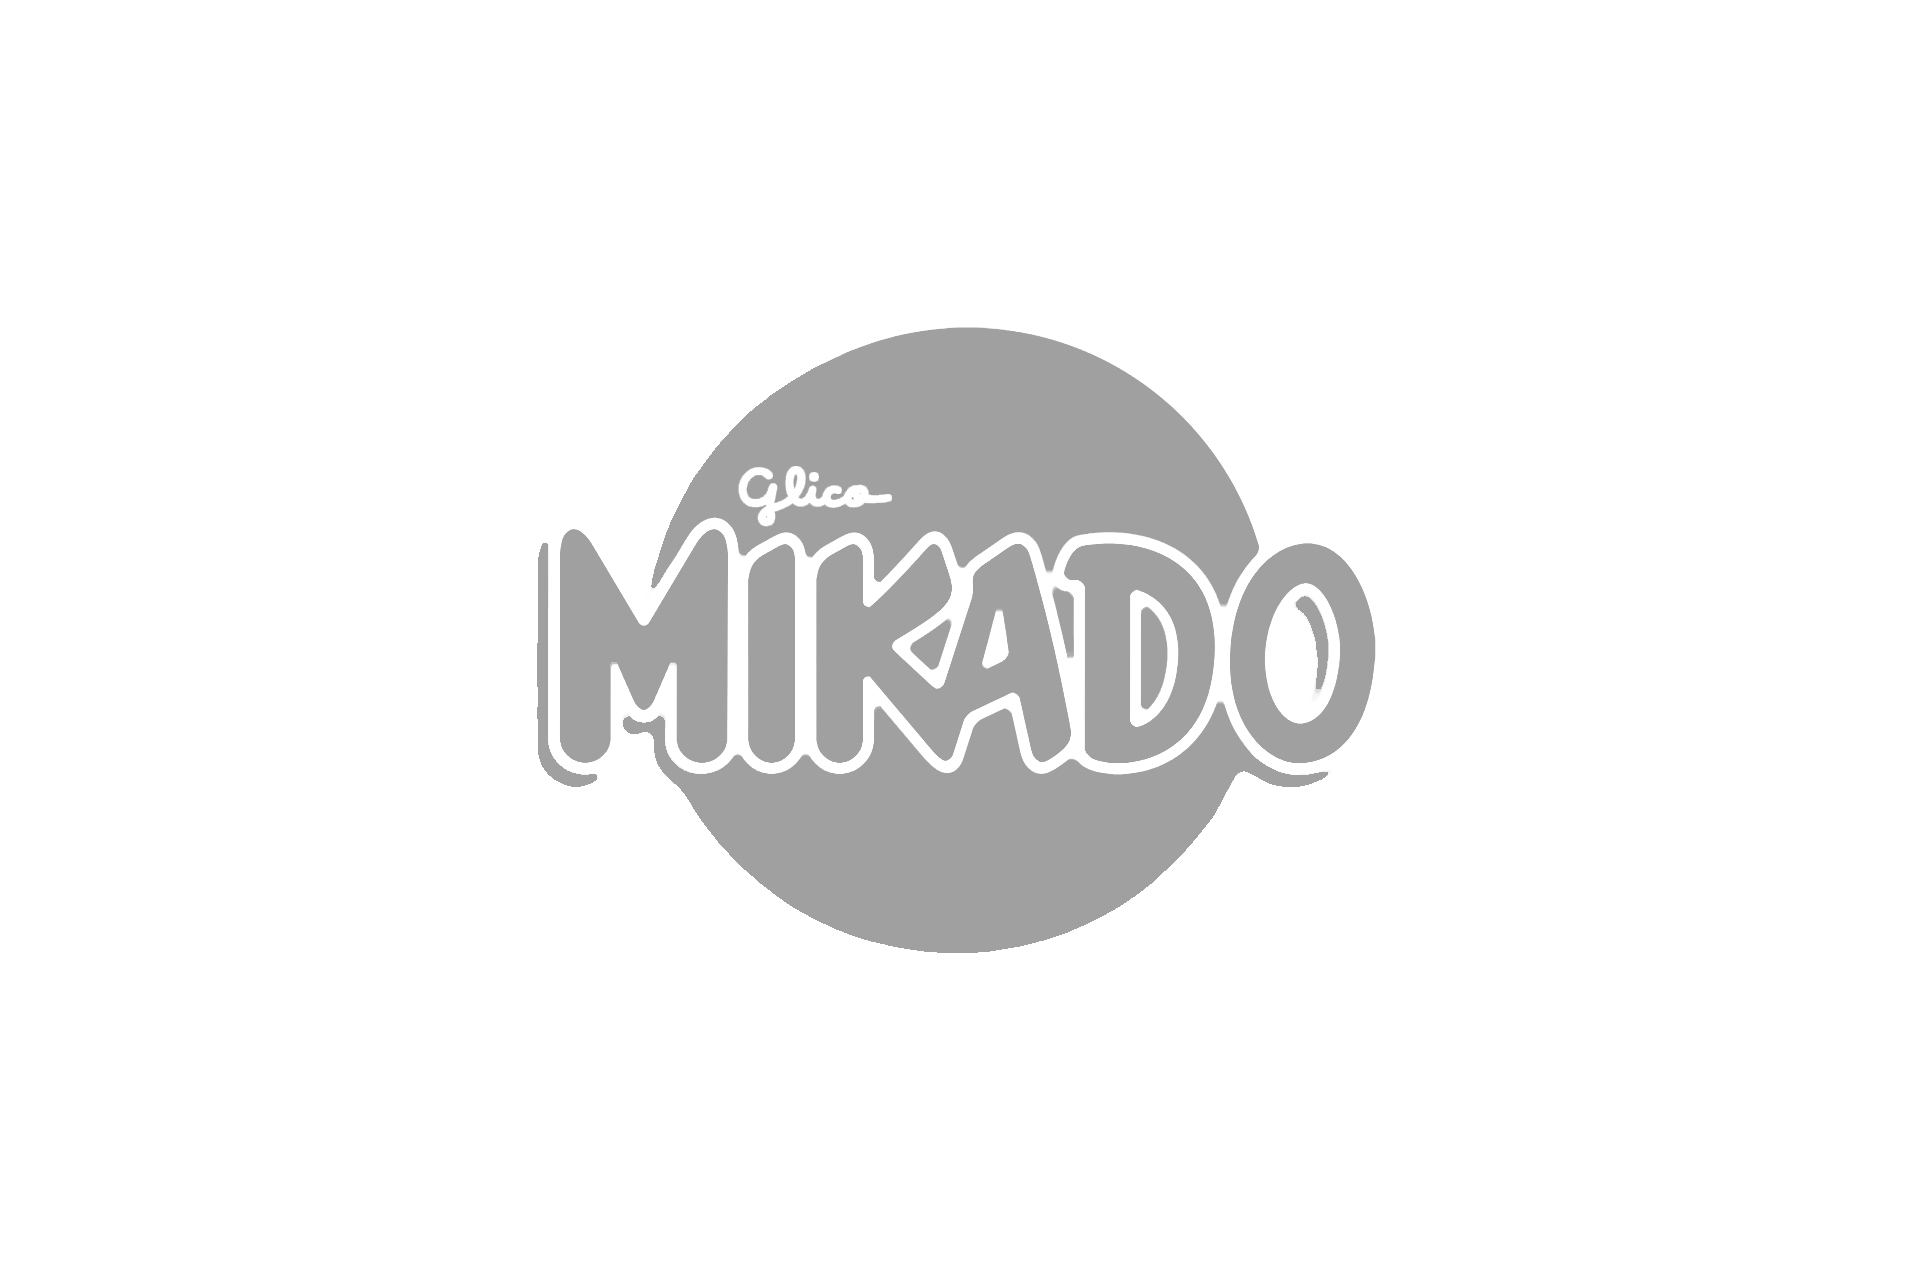 mikado logo grey